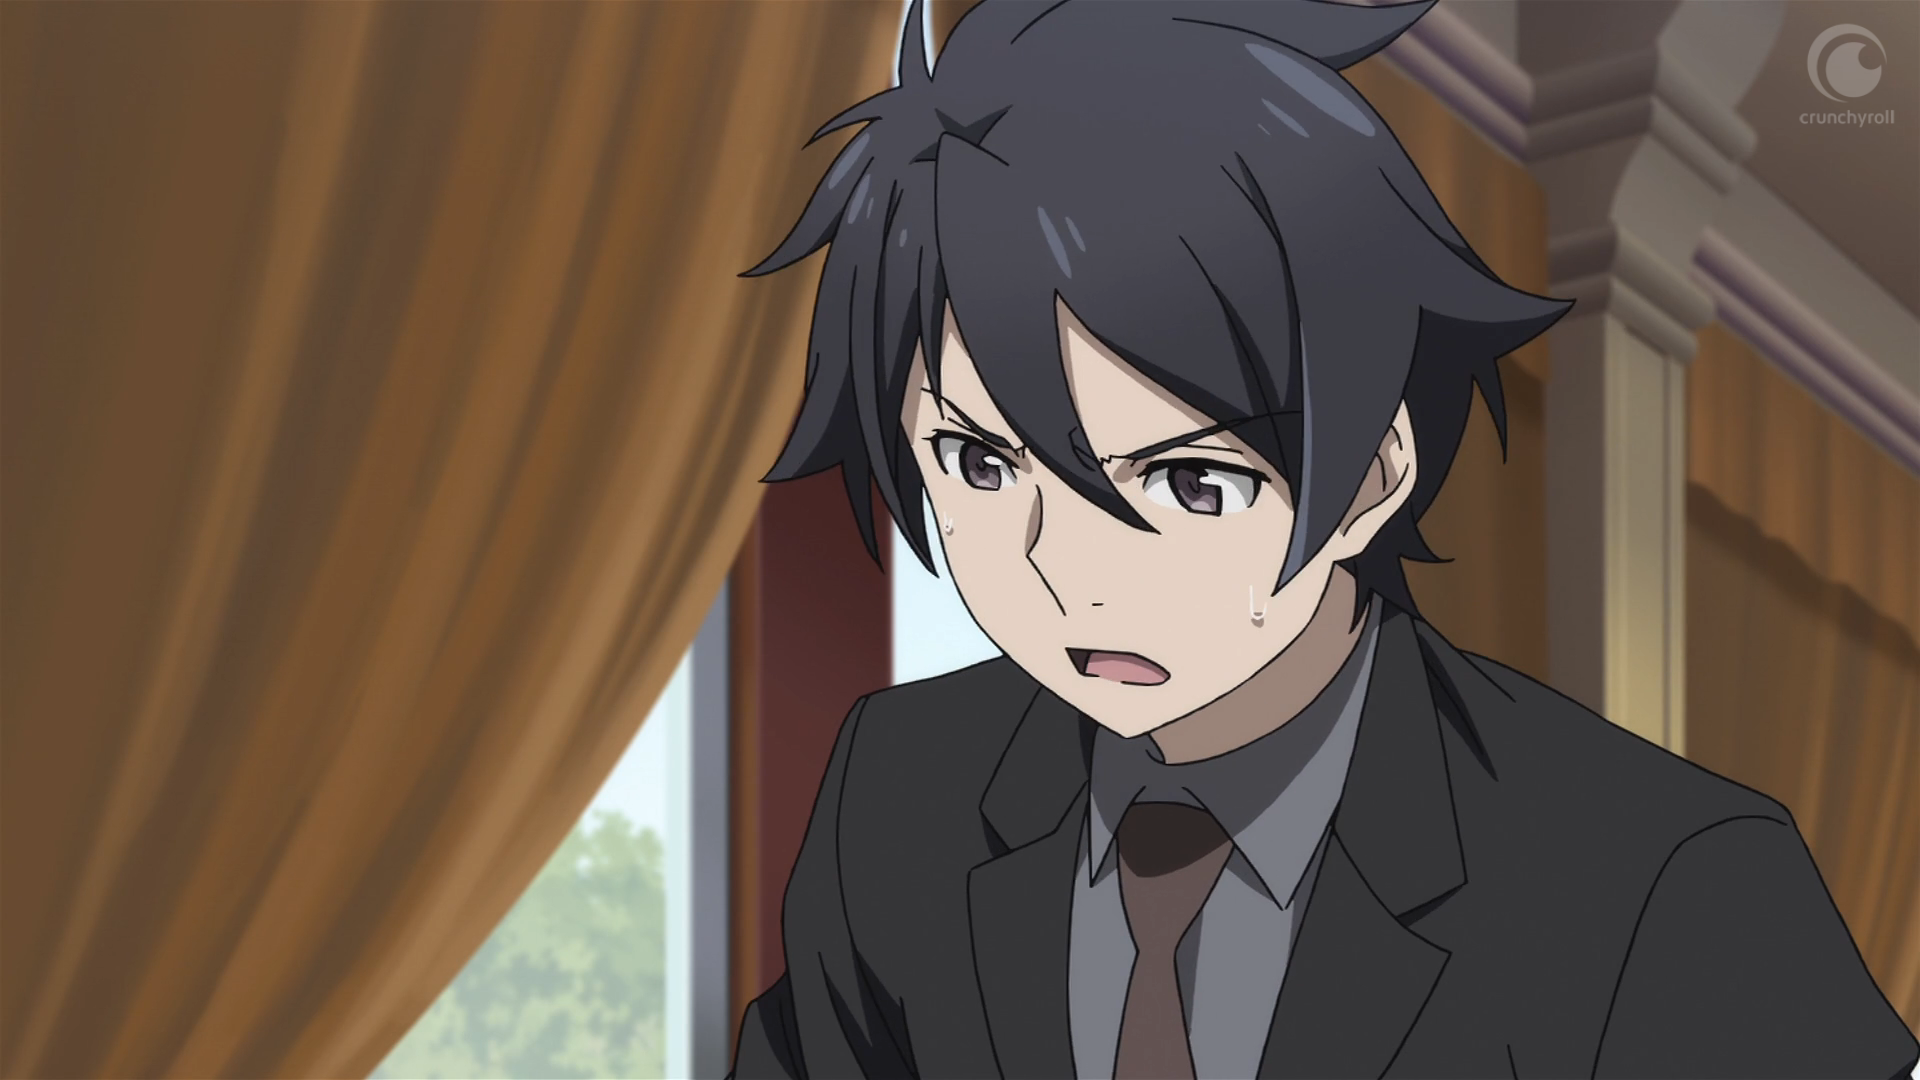 Review Classroom Crisis, Episode 10 Director Nagisa